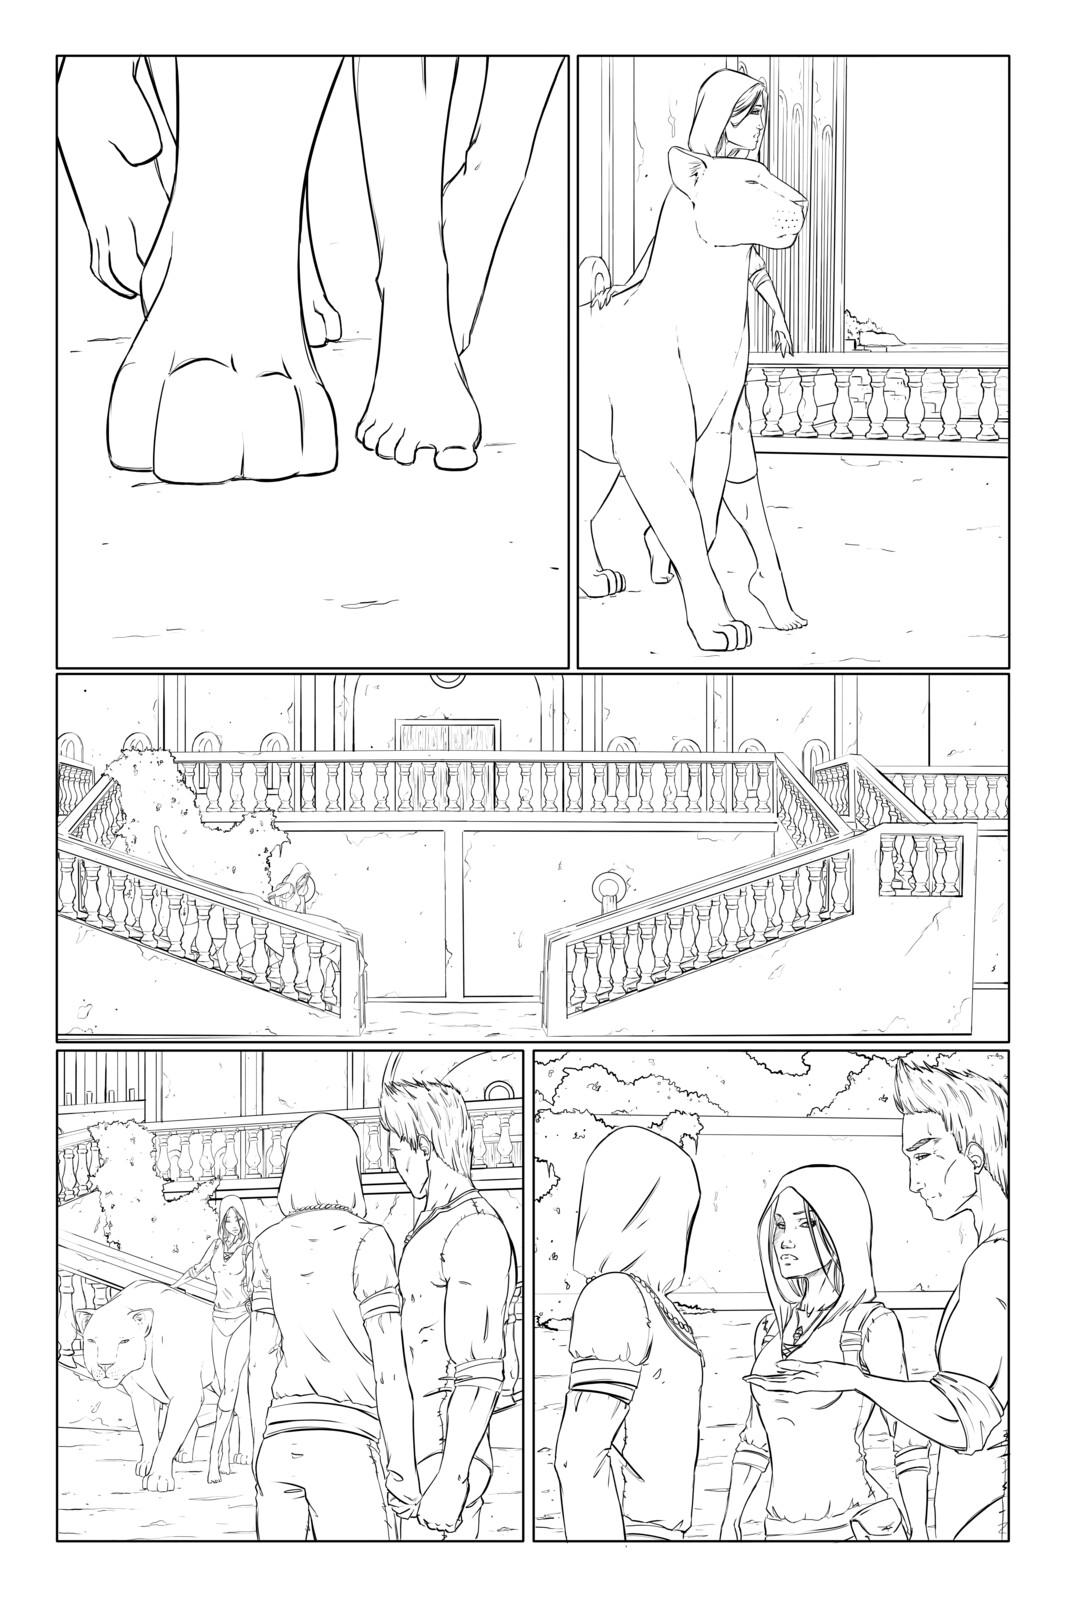 Page 29 - Line art